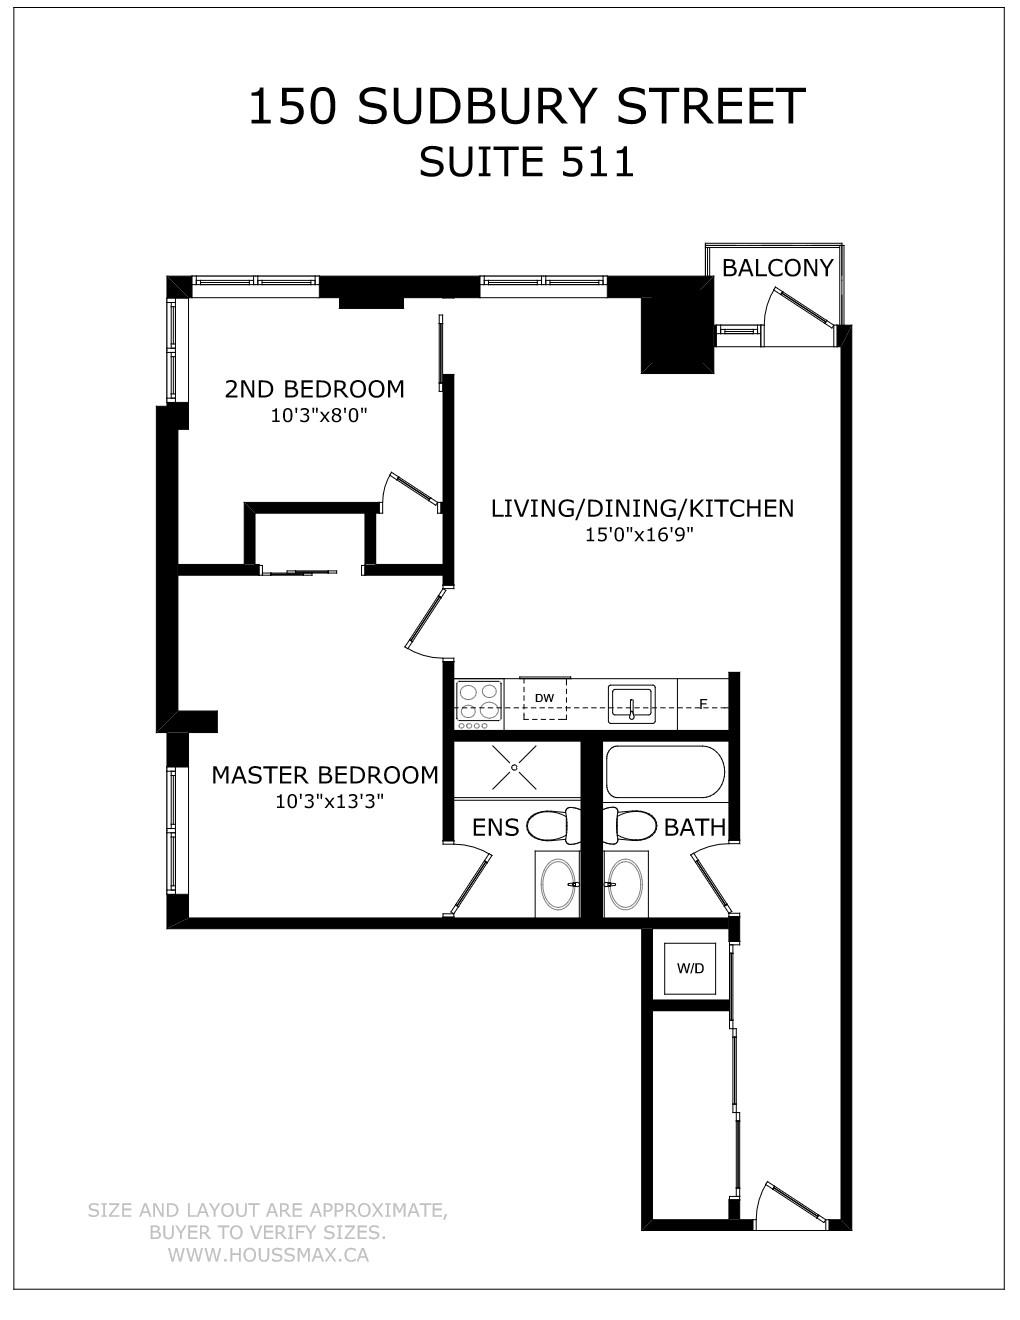 Floor plans for 150 Sudbury St Unit 511.